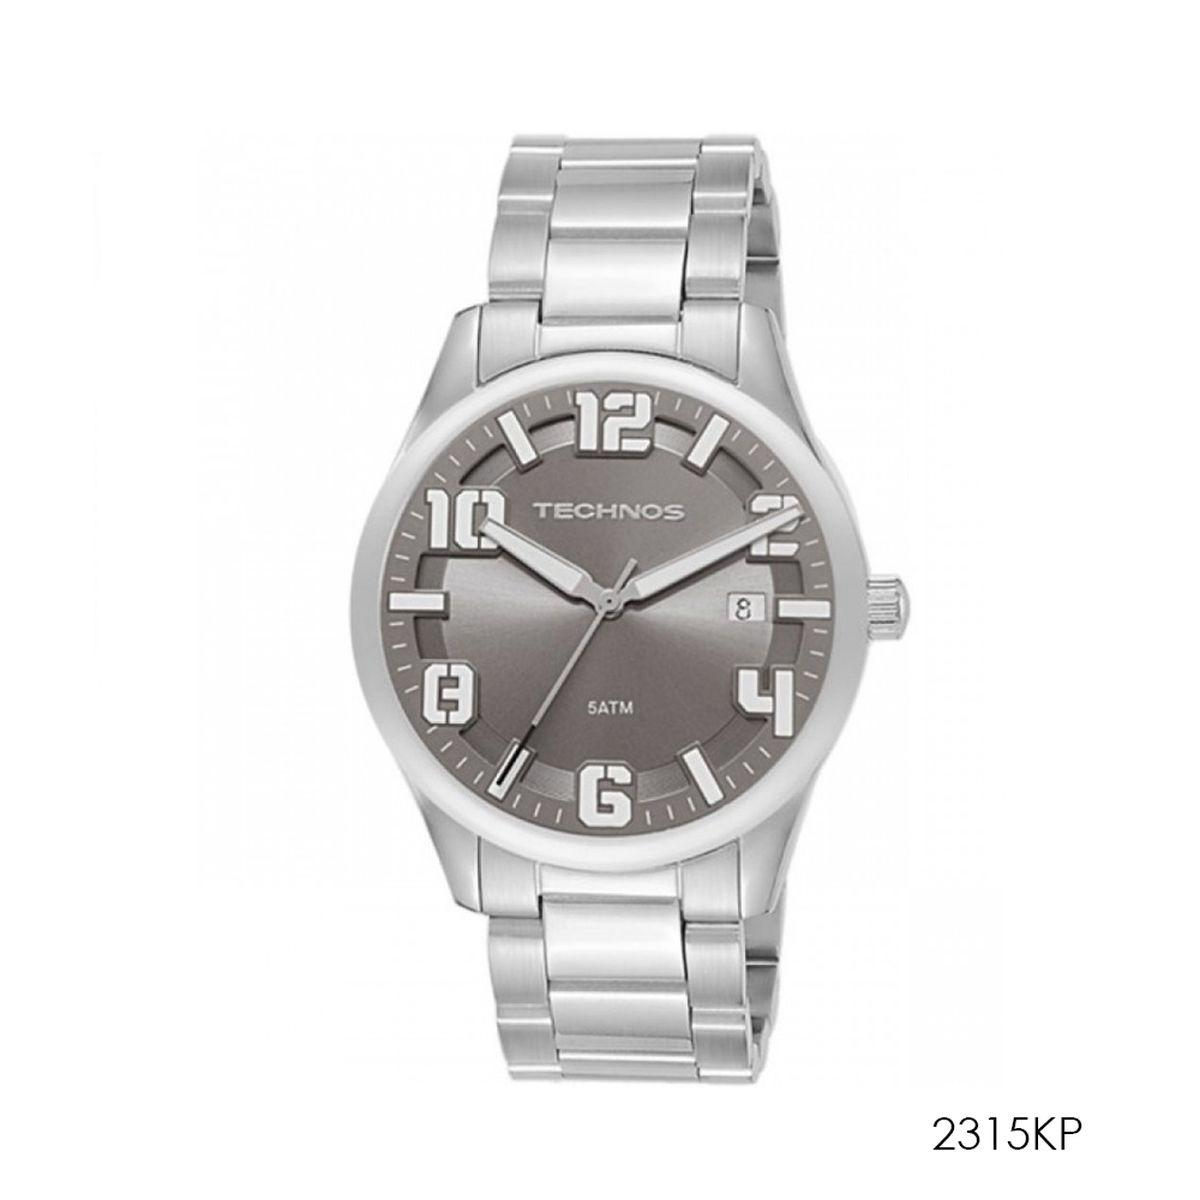 0d78fe023f365 Relógio technos masculino 2315kp - Relógio Masculino - Magazine Luiza